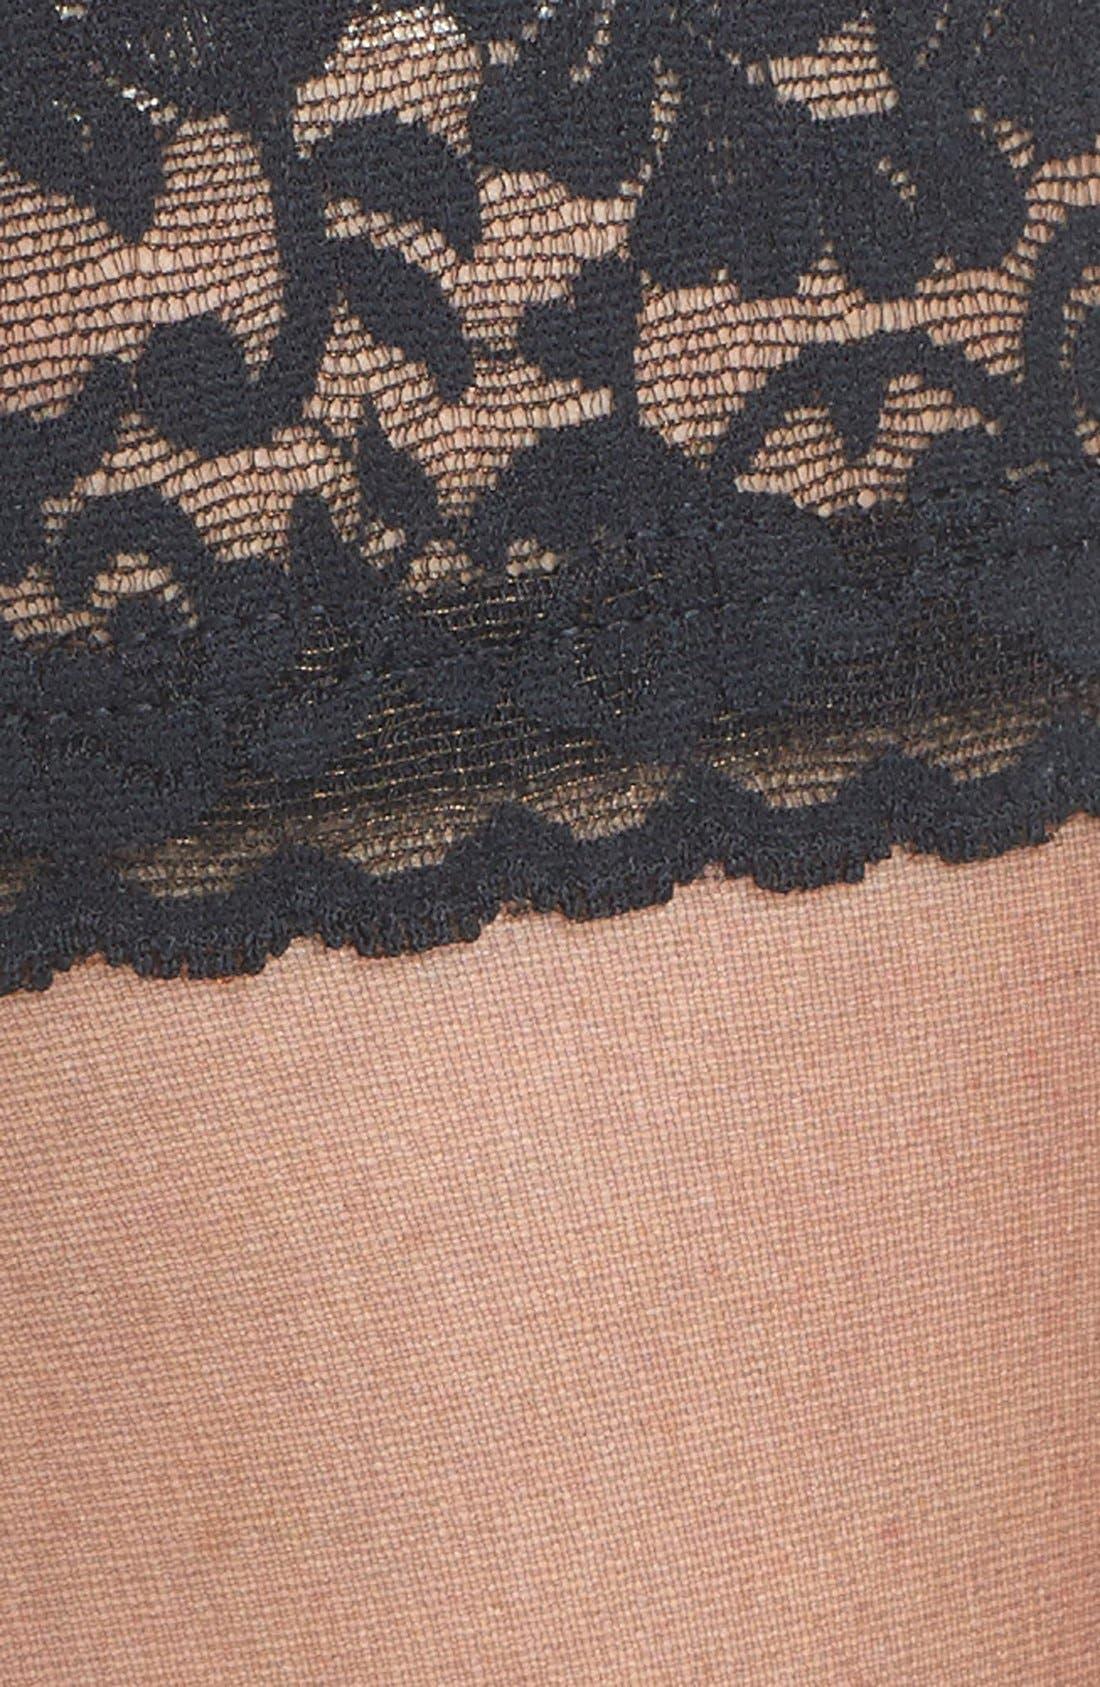 Stay-Up Stockings,                             Alternate thumbnail 2, color,                             FANTASY BLACK